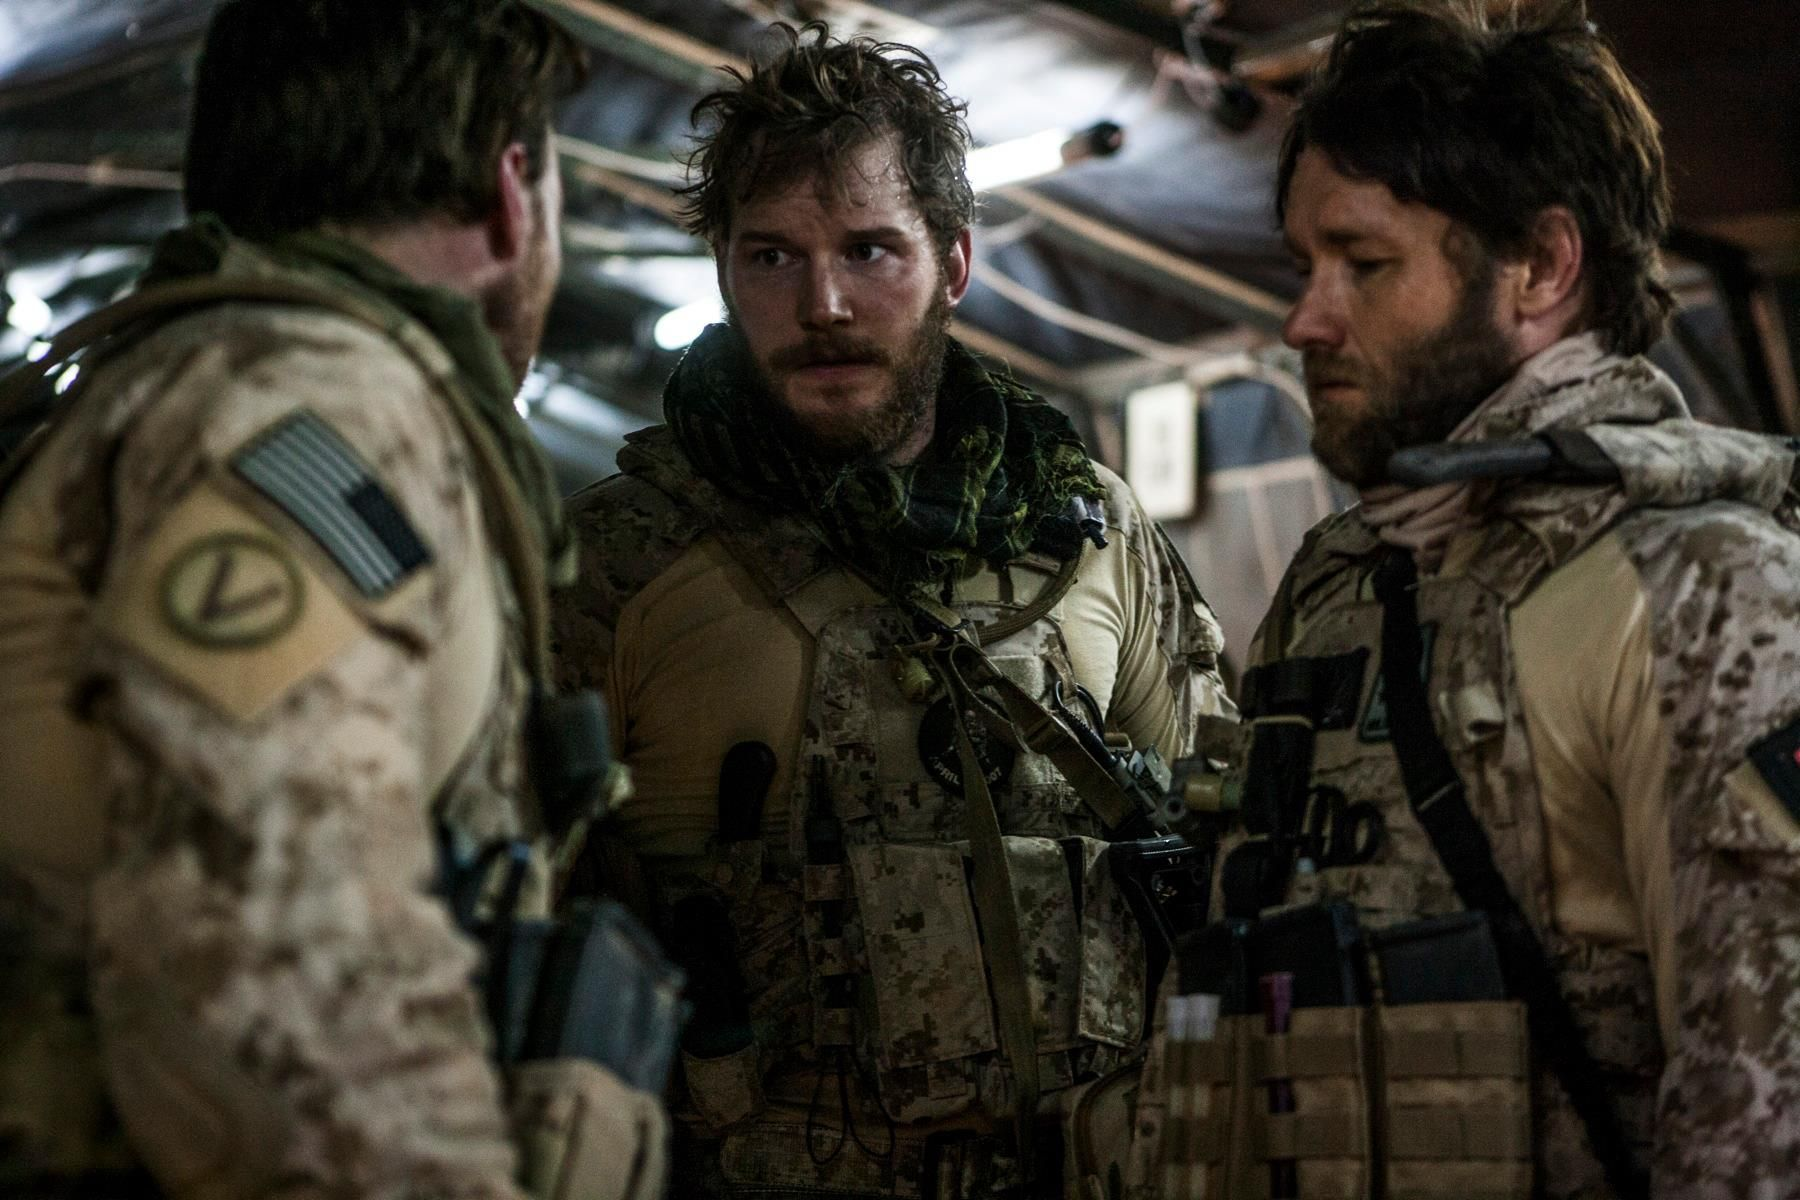 Pin By Lethal Beavers On Film Chris Pratt Chris Pratt Movies Guardians Of The Galaxy